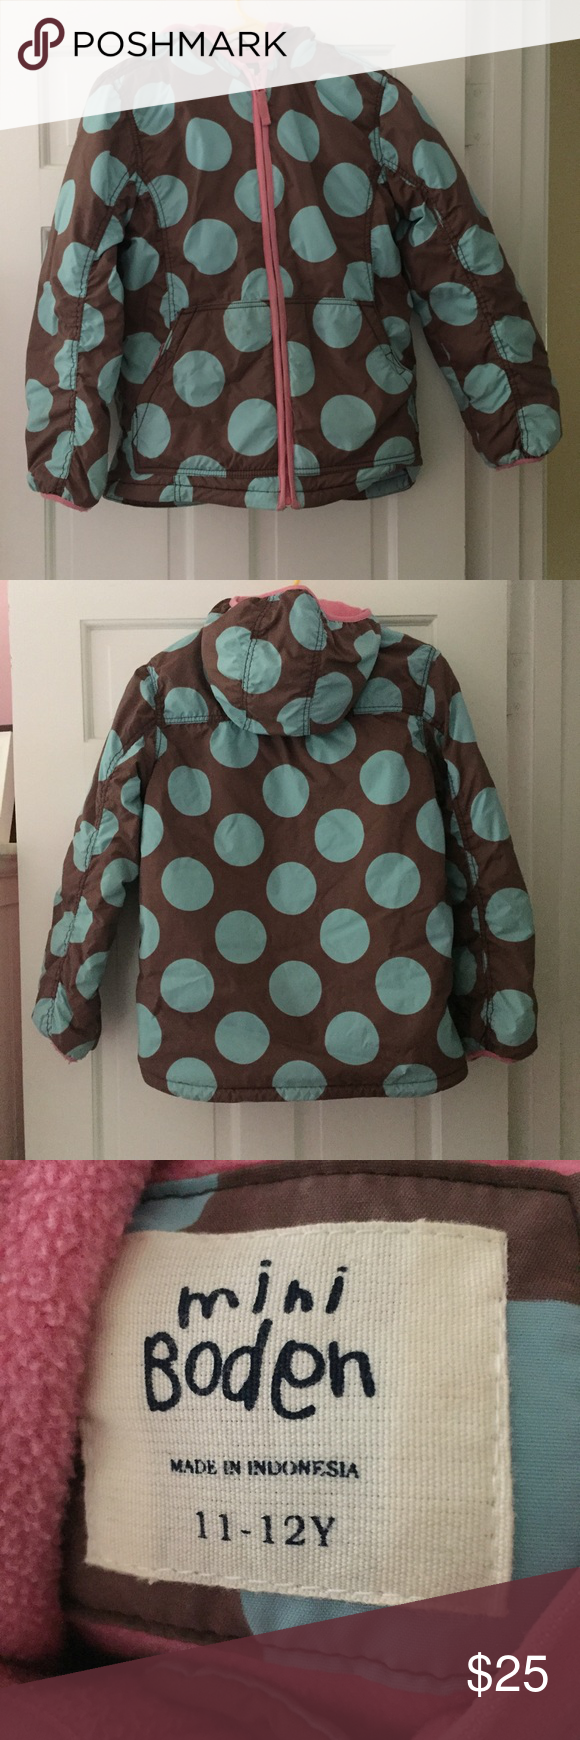 Mini Biden polka dot coat Mini Boden polka dot jacket. Zip up jacket. Good condition. Mini Boden Jackets & Coats